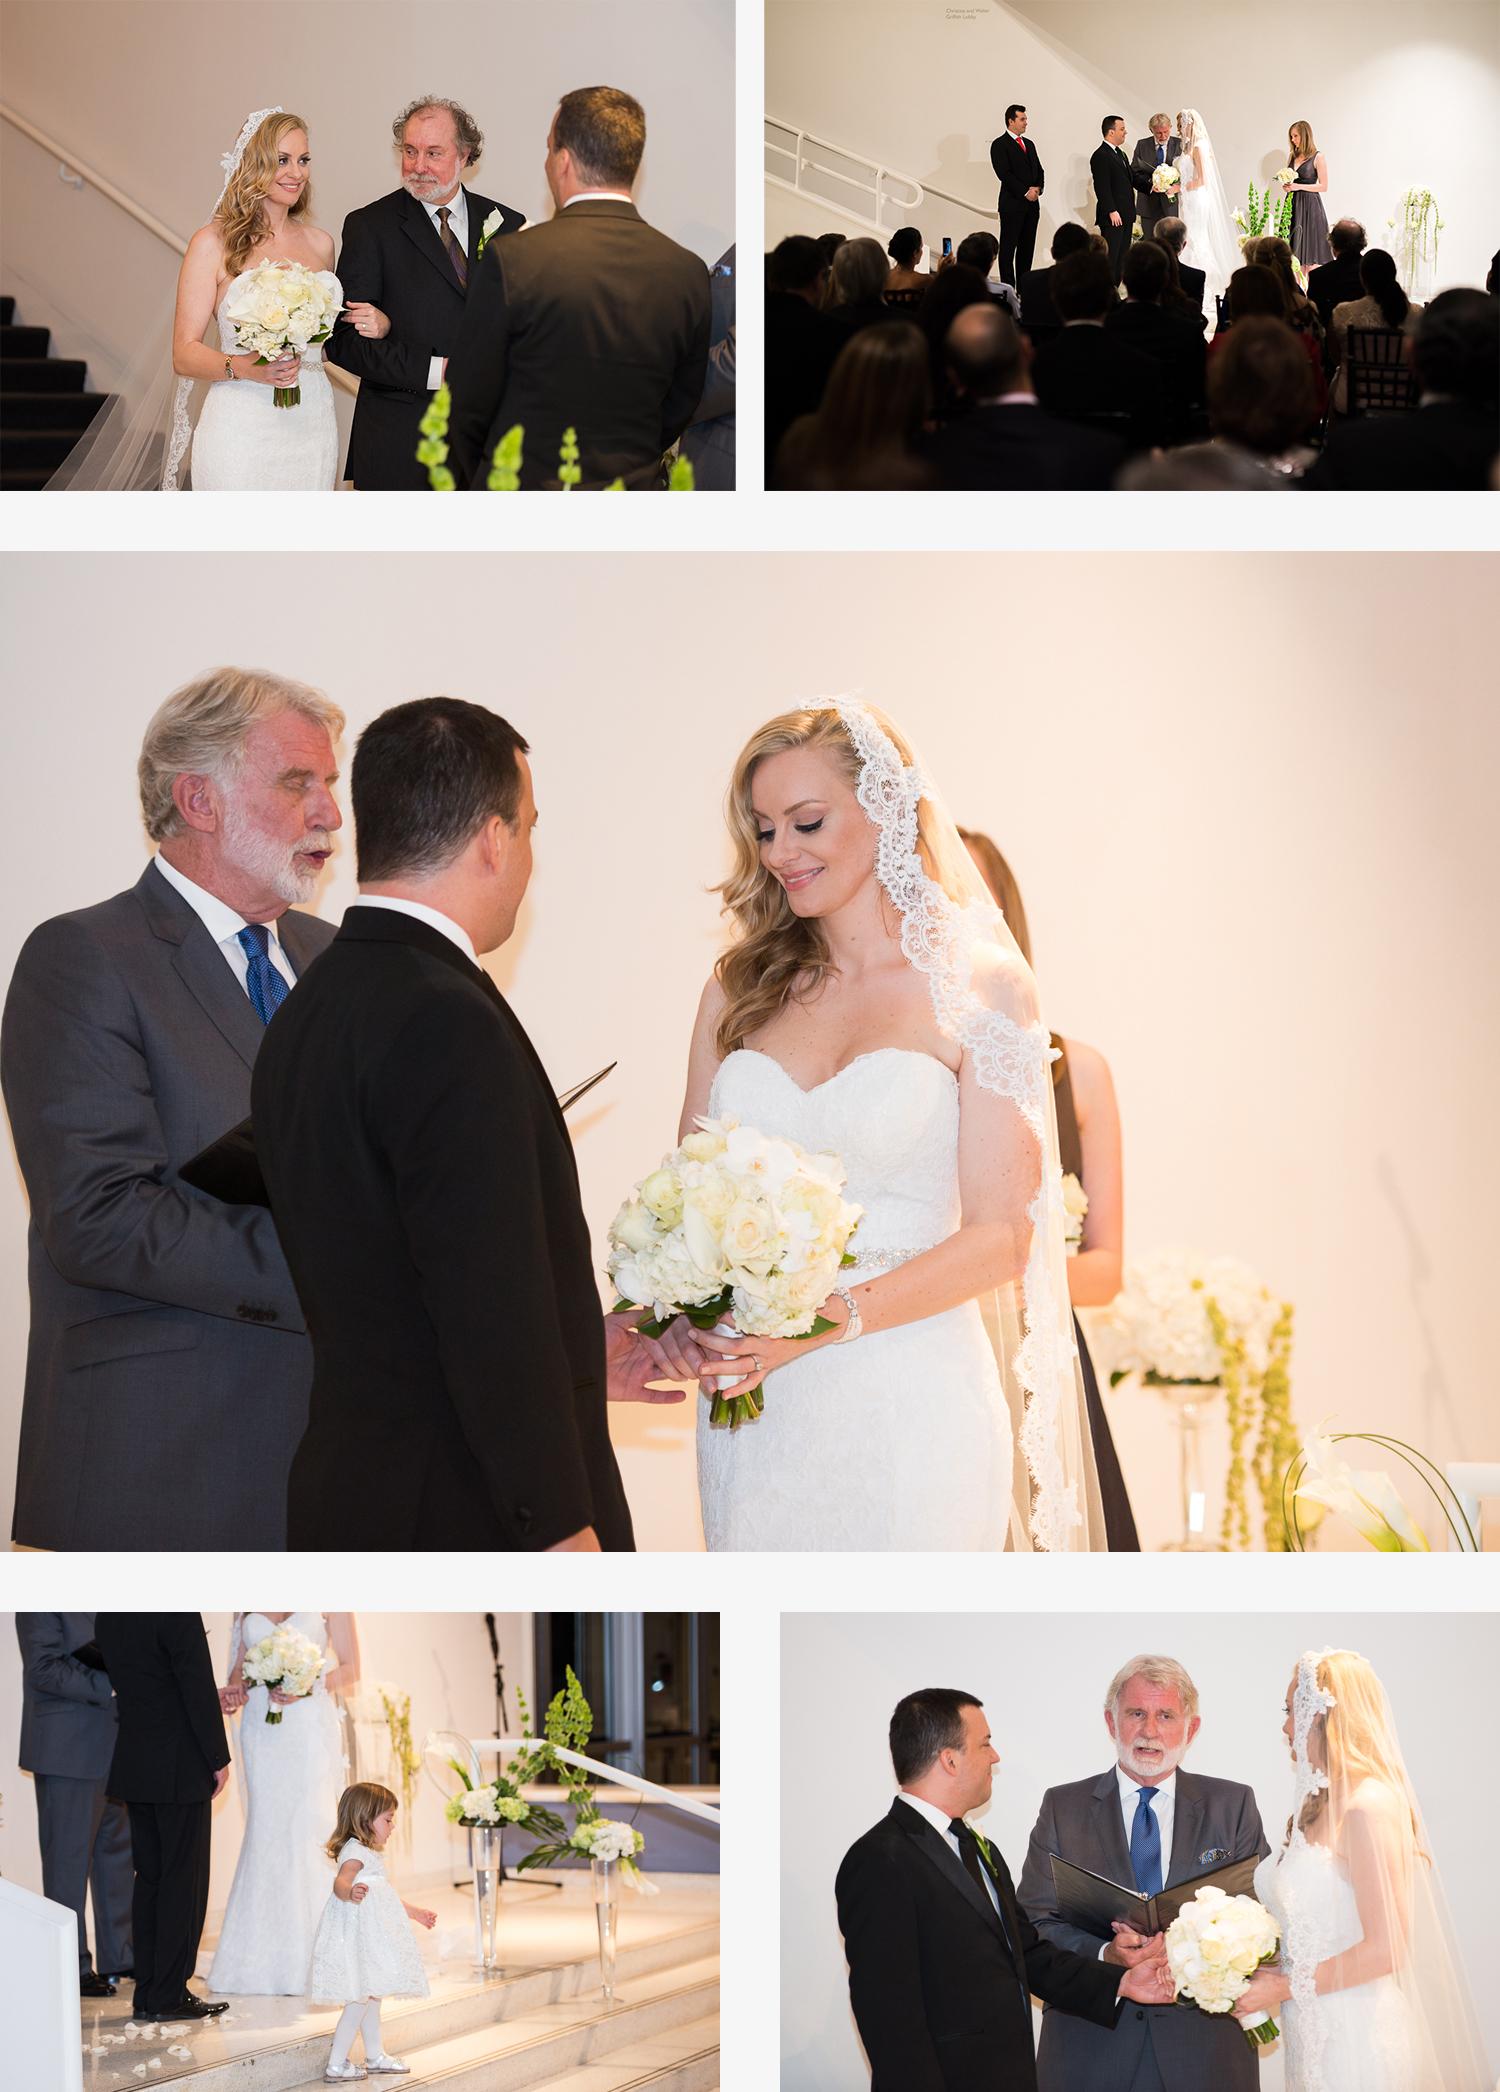 brandwold.se-miami-wedding-fortlauderdale-111